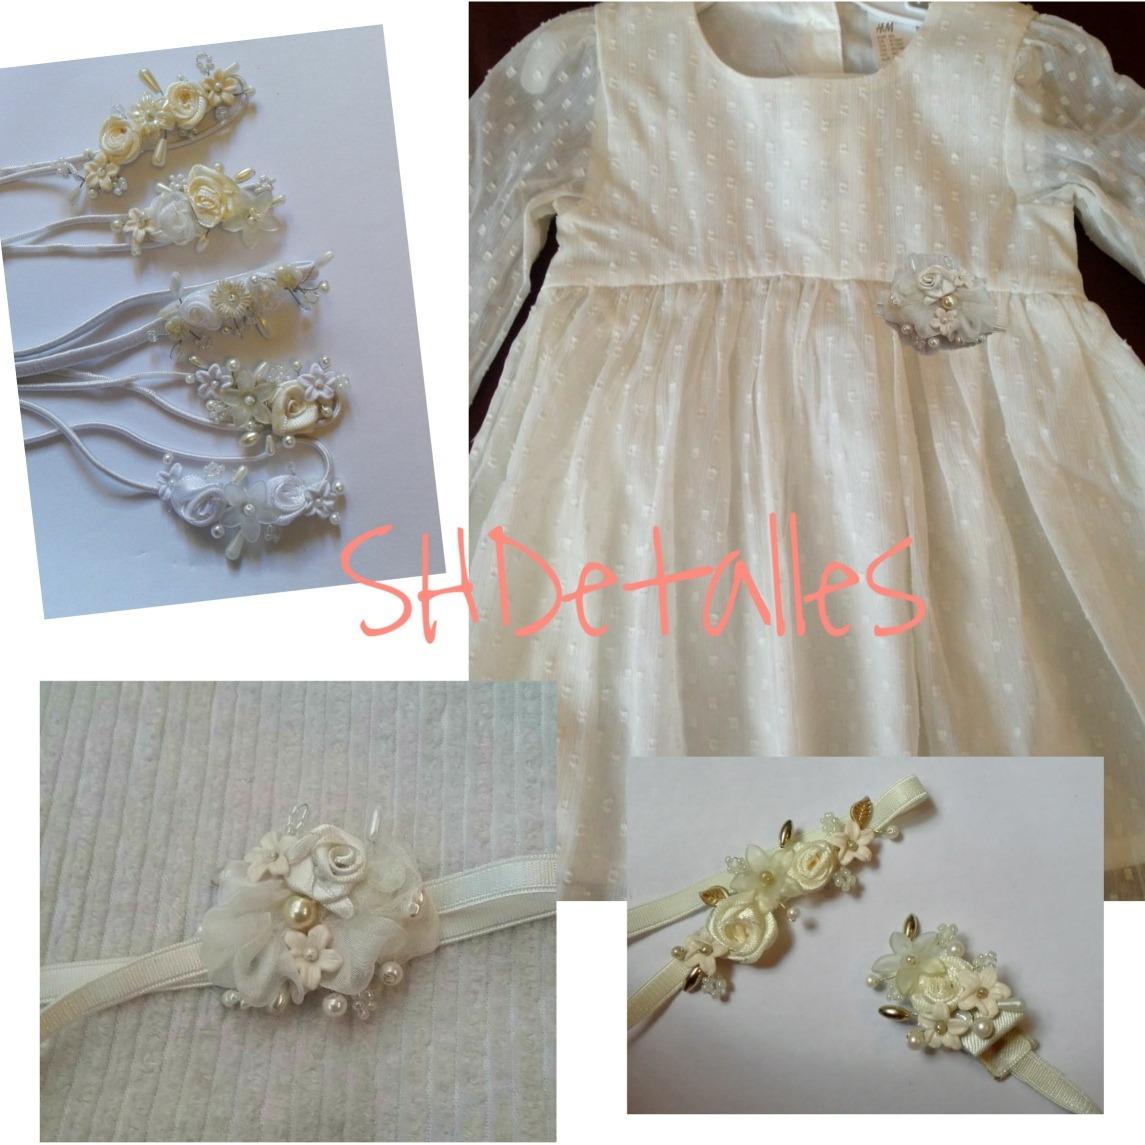 Aplique Flores TocadoDetalle Vestido Set Vinchita Perlas rCxQdtBsh